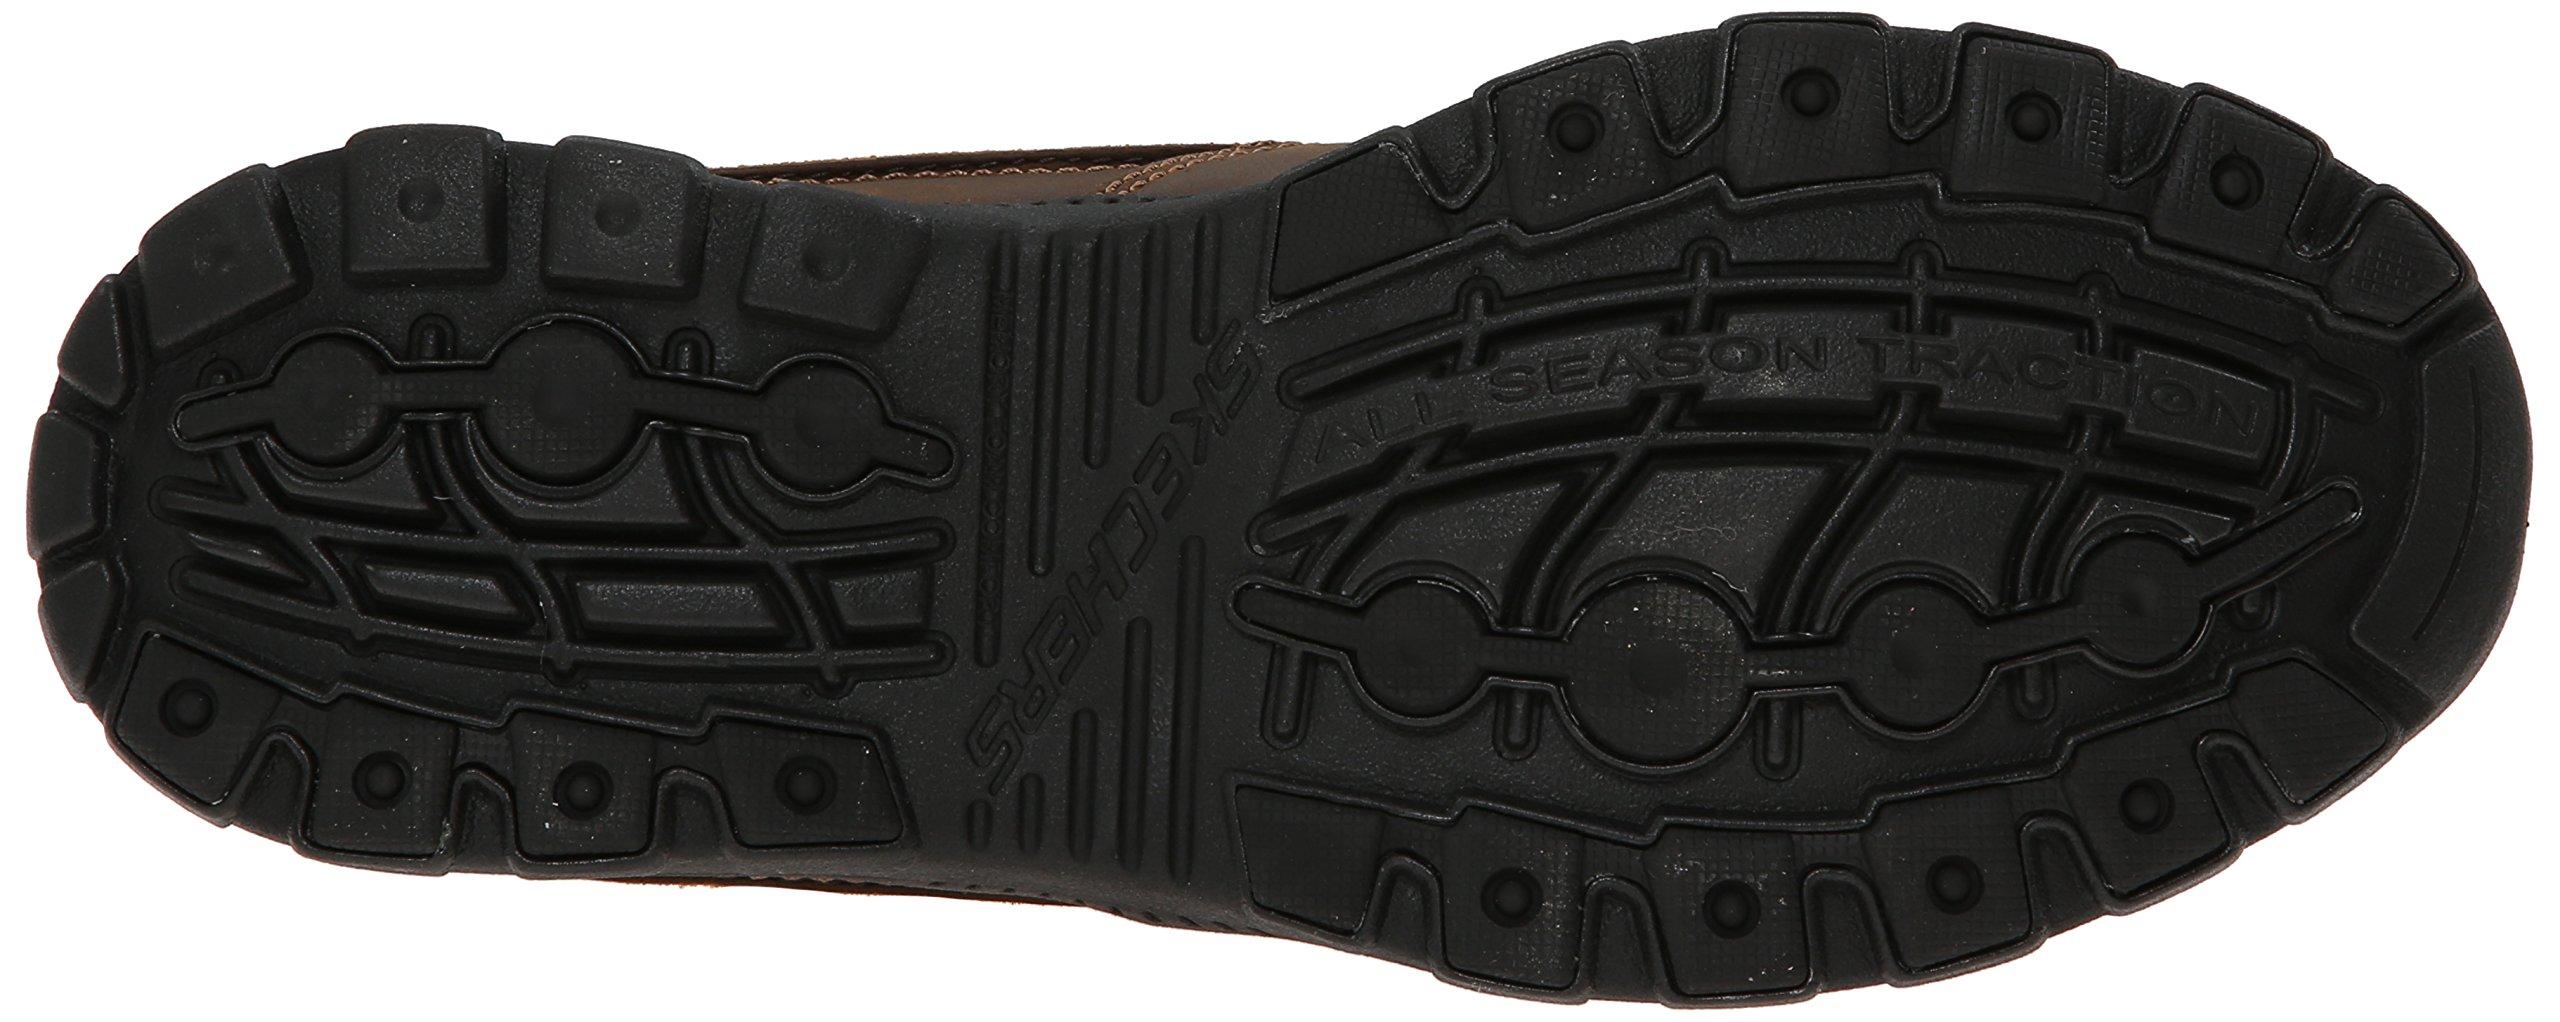 0f3aa222f8fac Skechers USA Men's Braver Rayland Slip-On Loafer,Dark Brown Leather ...